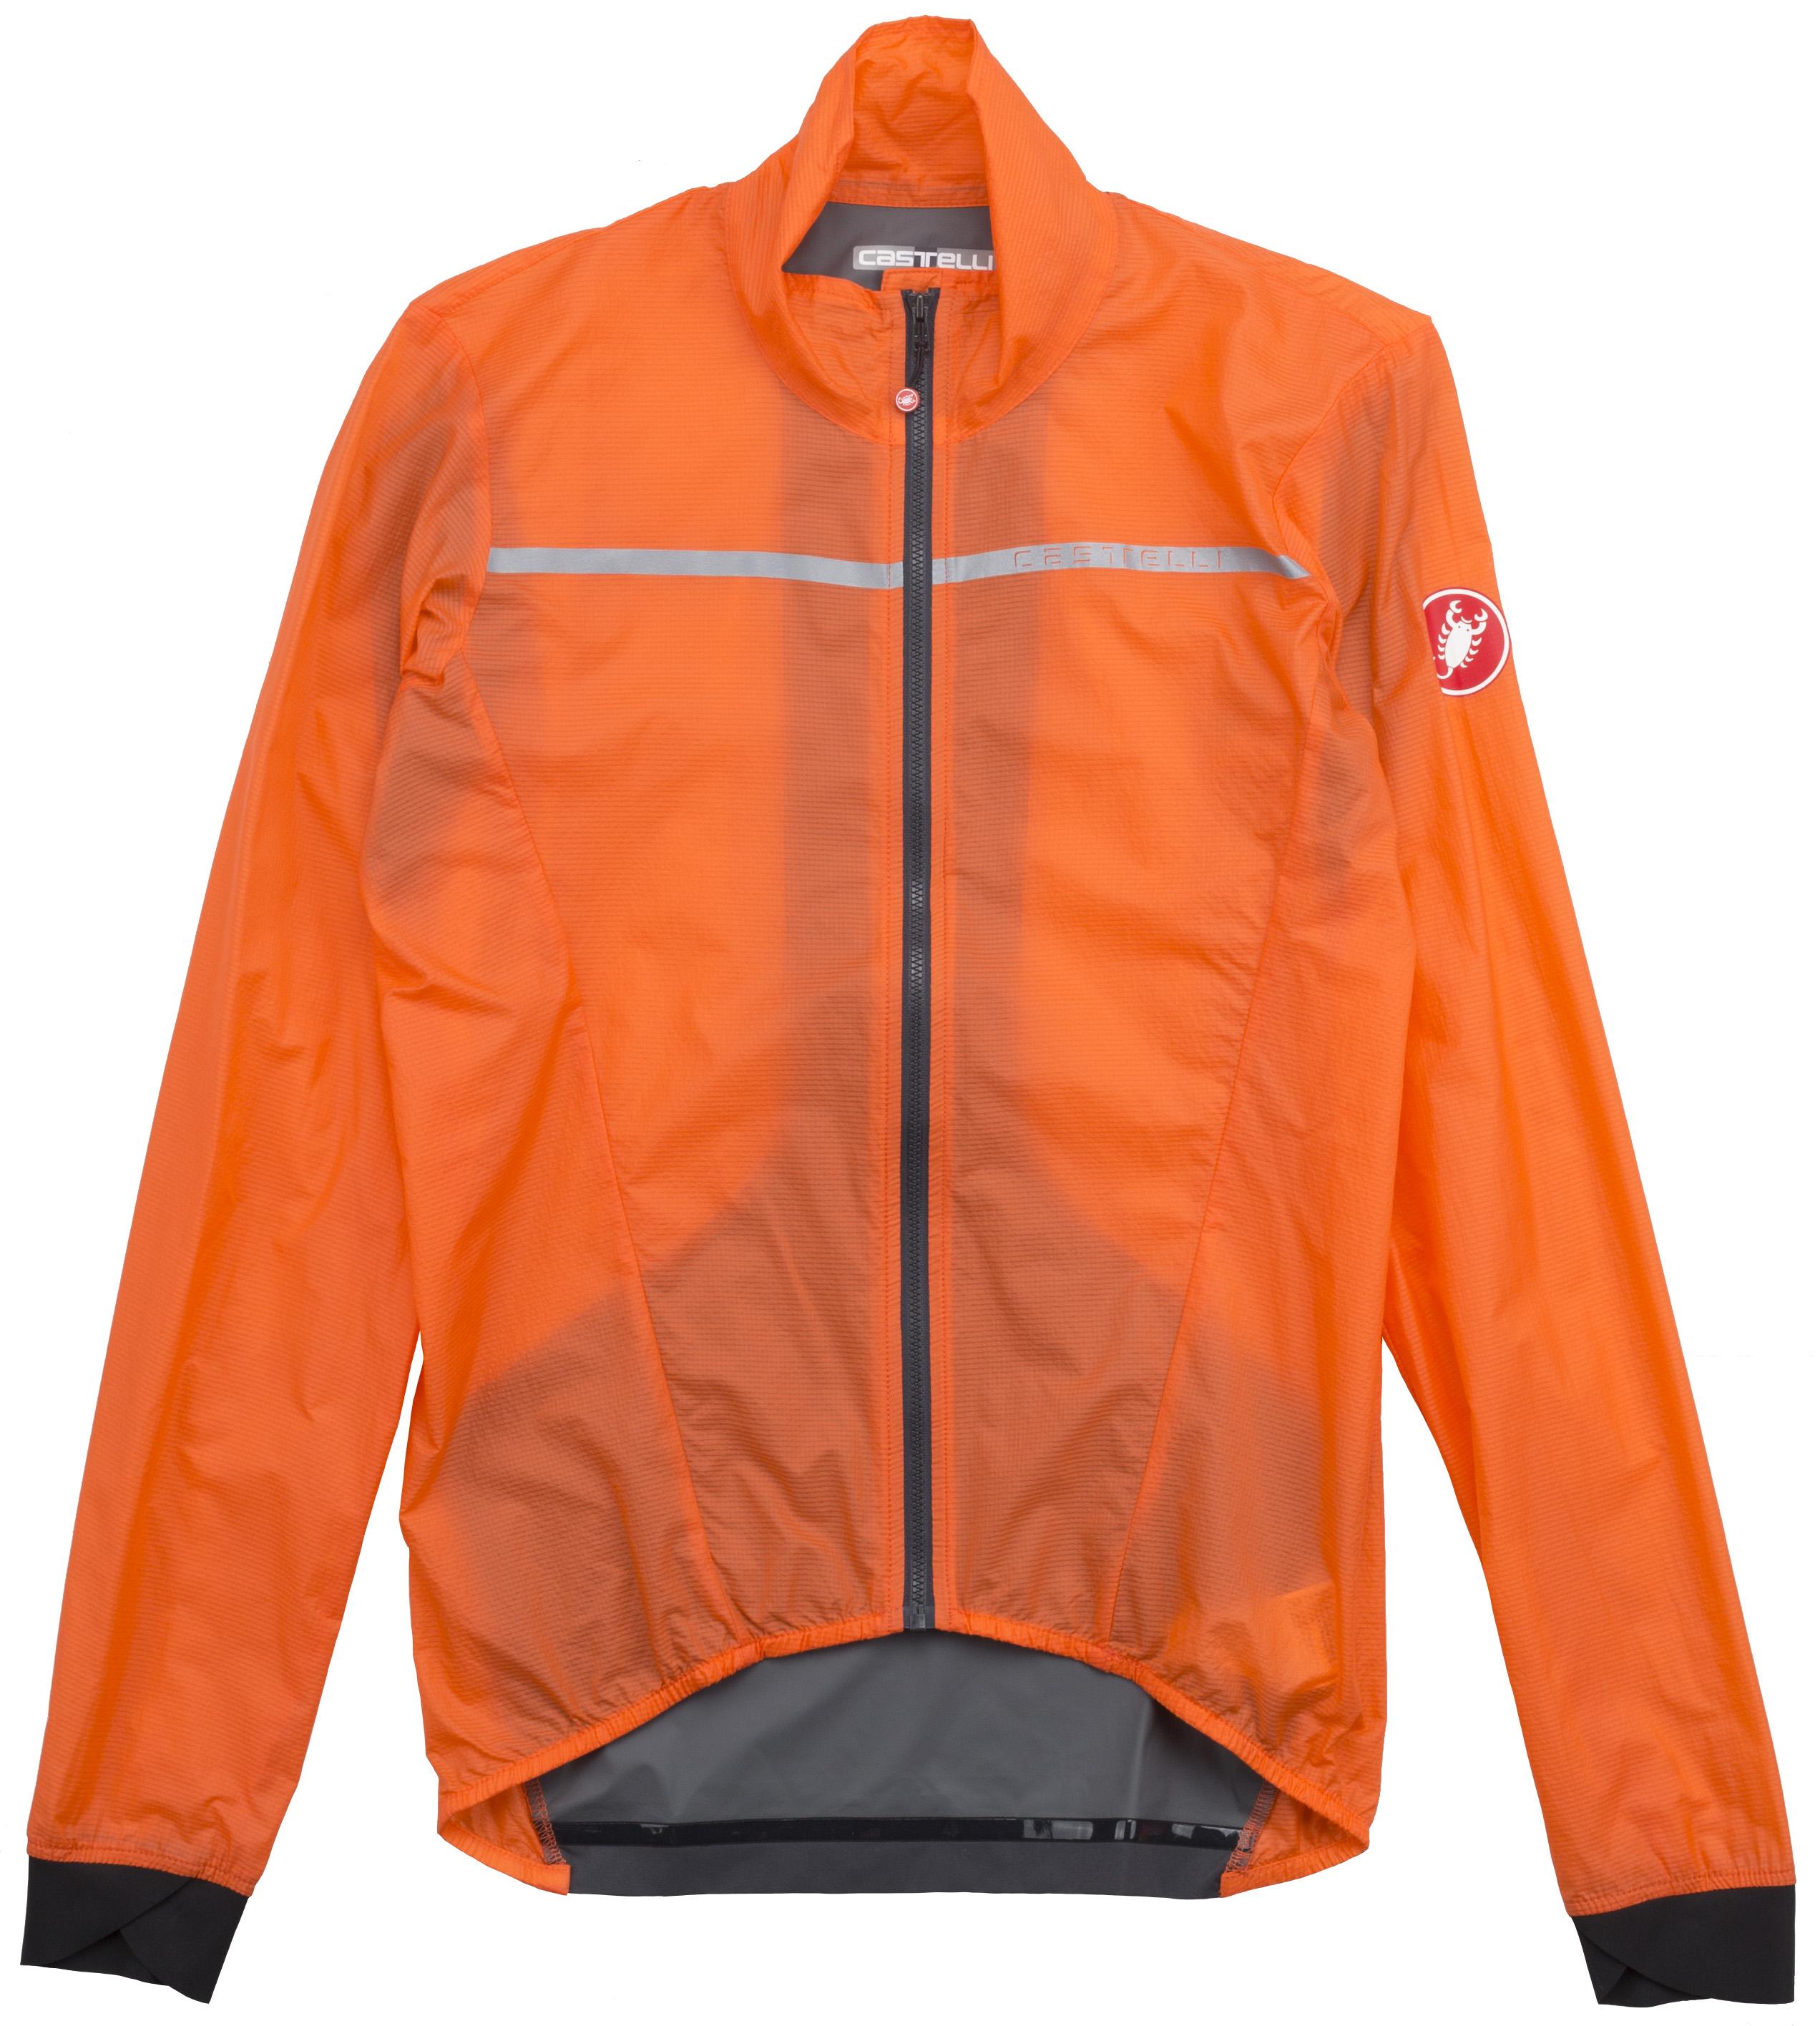 Castelli Superleggera Cycling Jacket